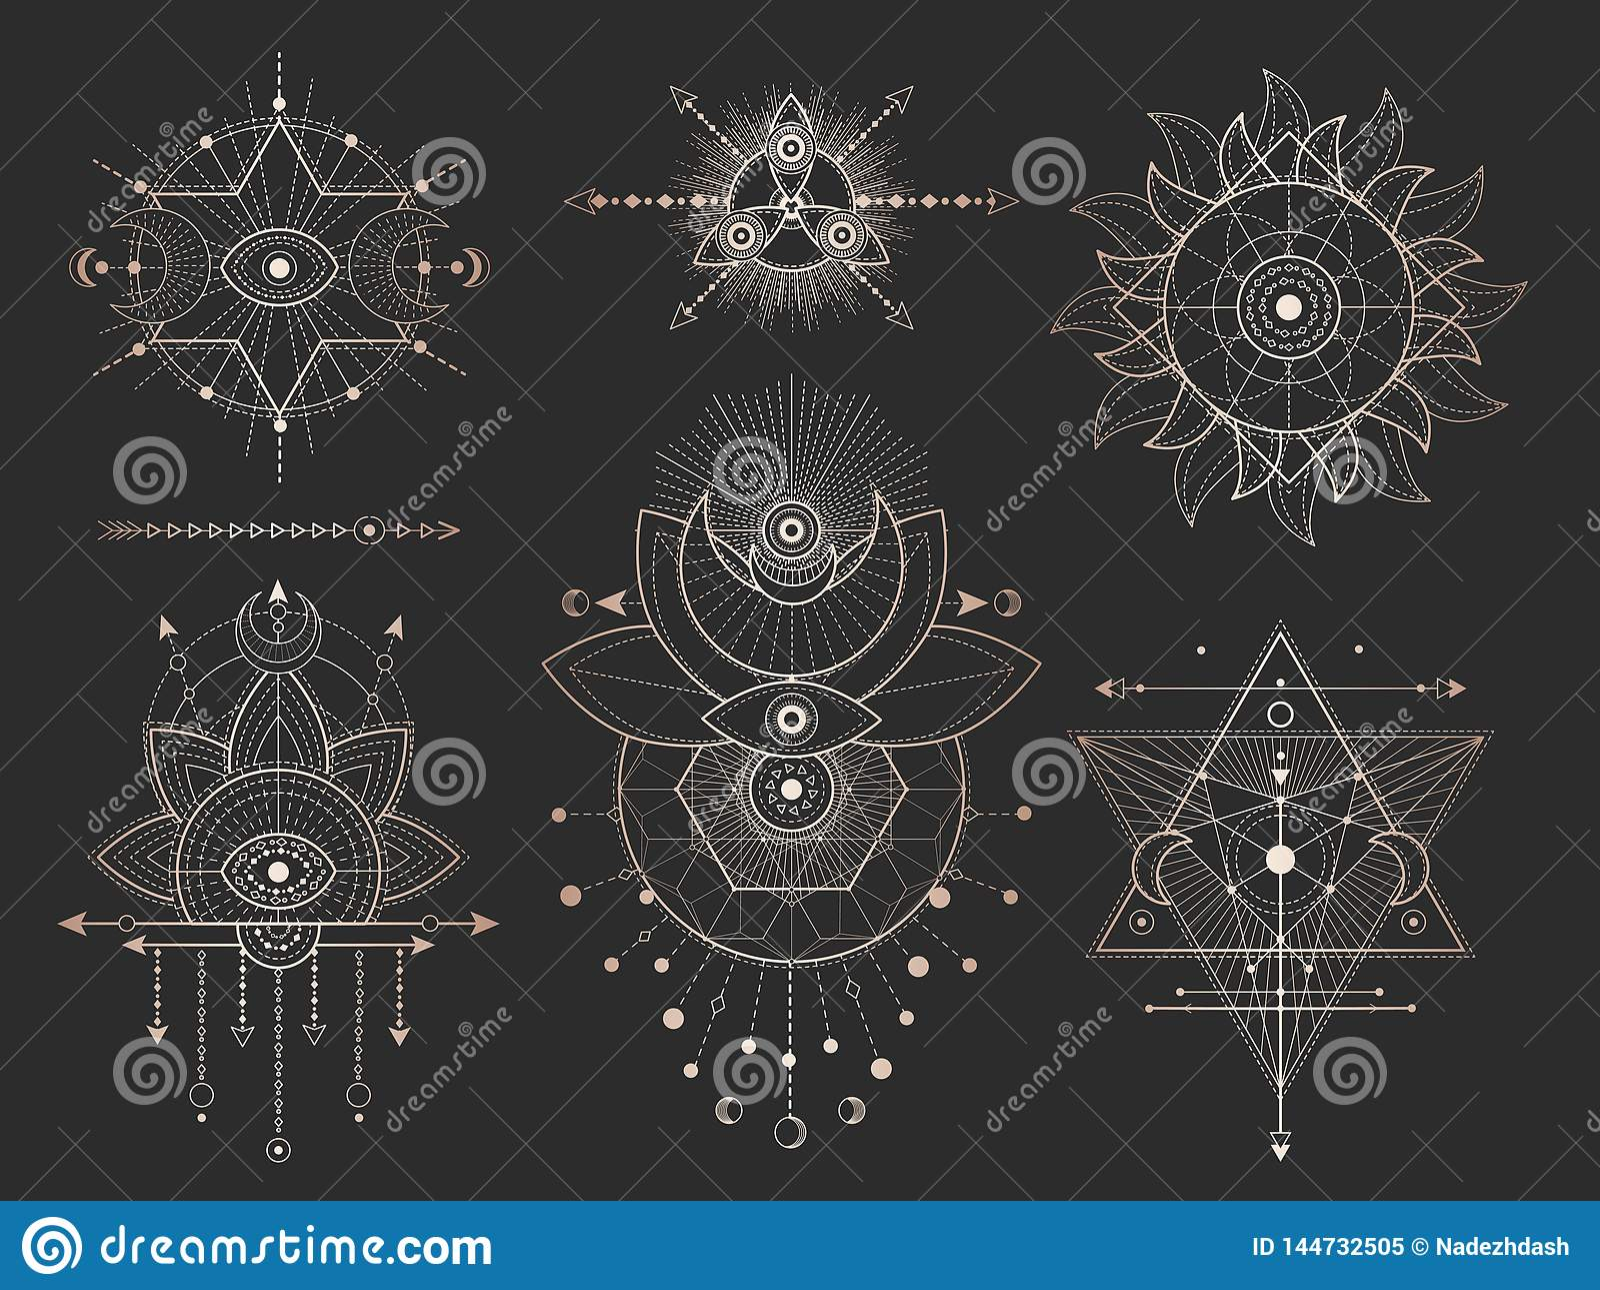 Vector Set Of Sacred Geometric Symbols And Figures On Black